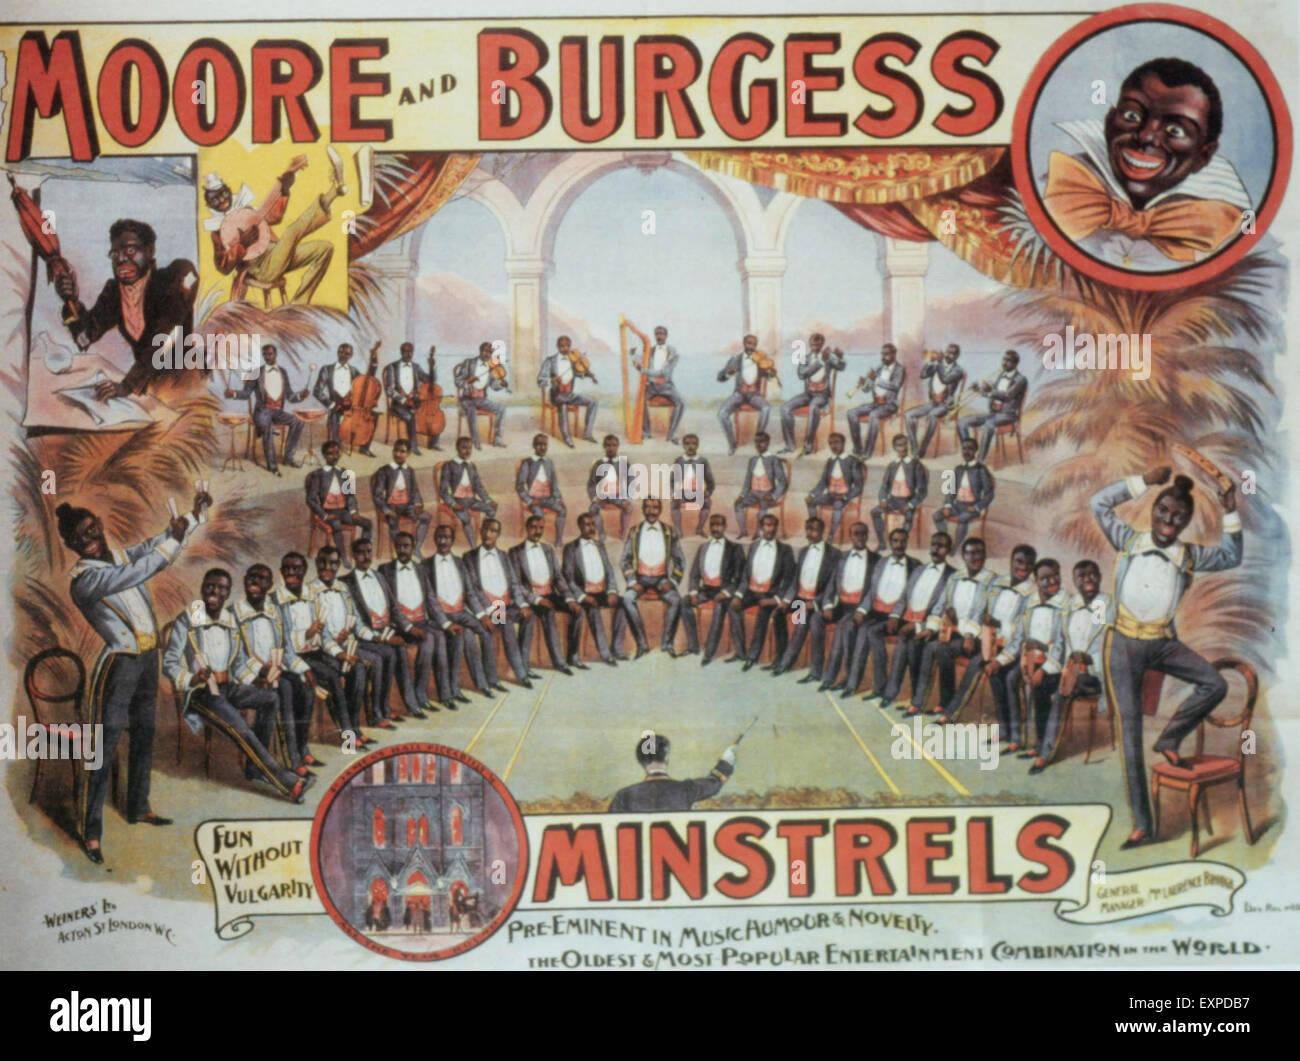 1900s USA Moore and Burgess Magazine Advert - Stock Image